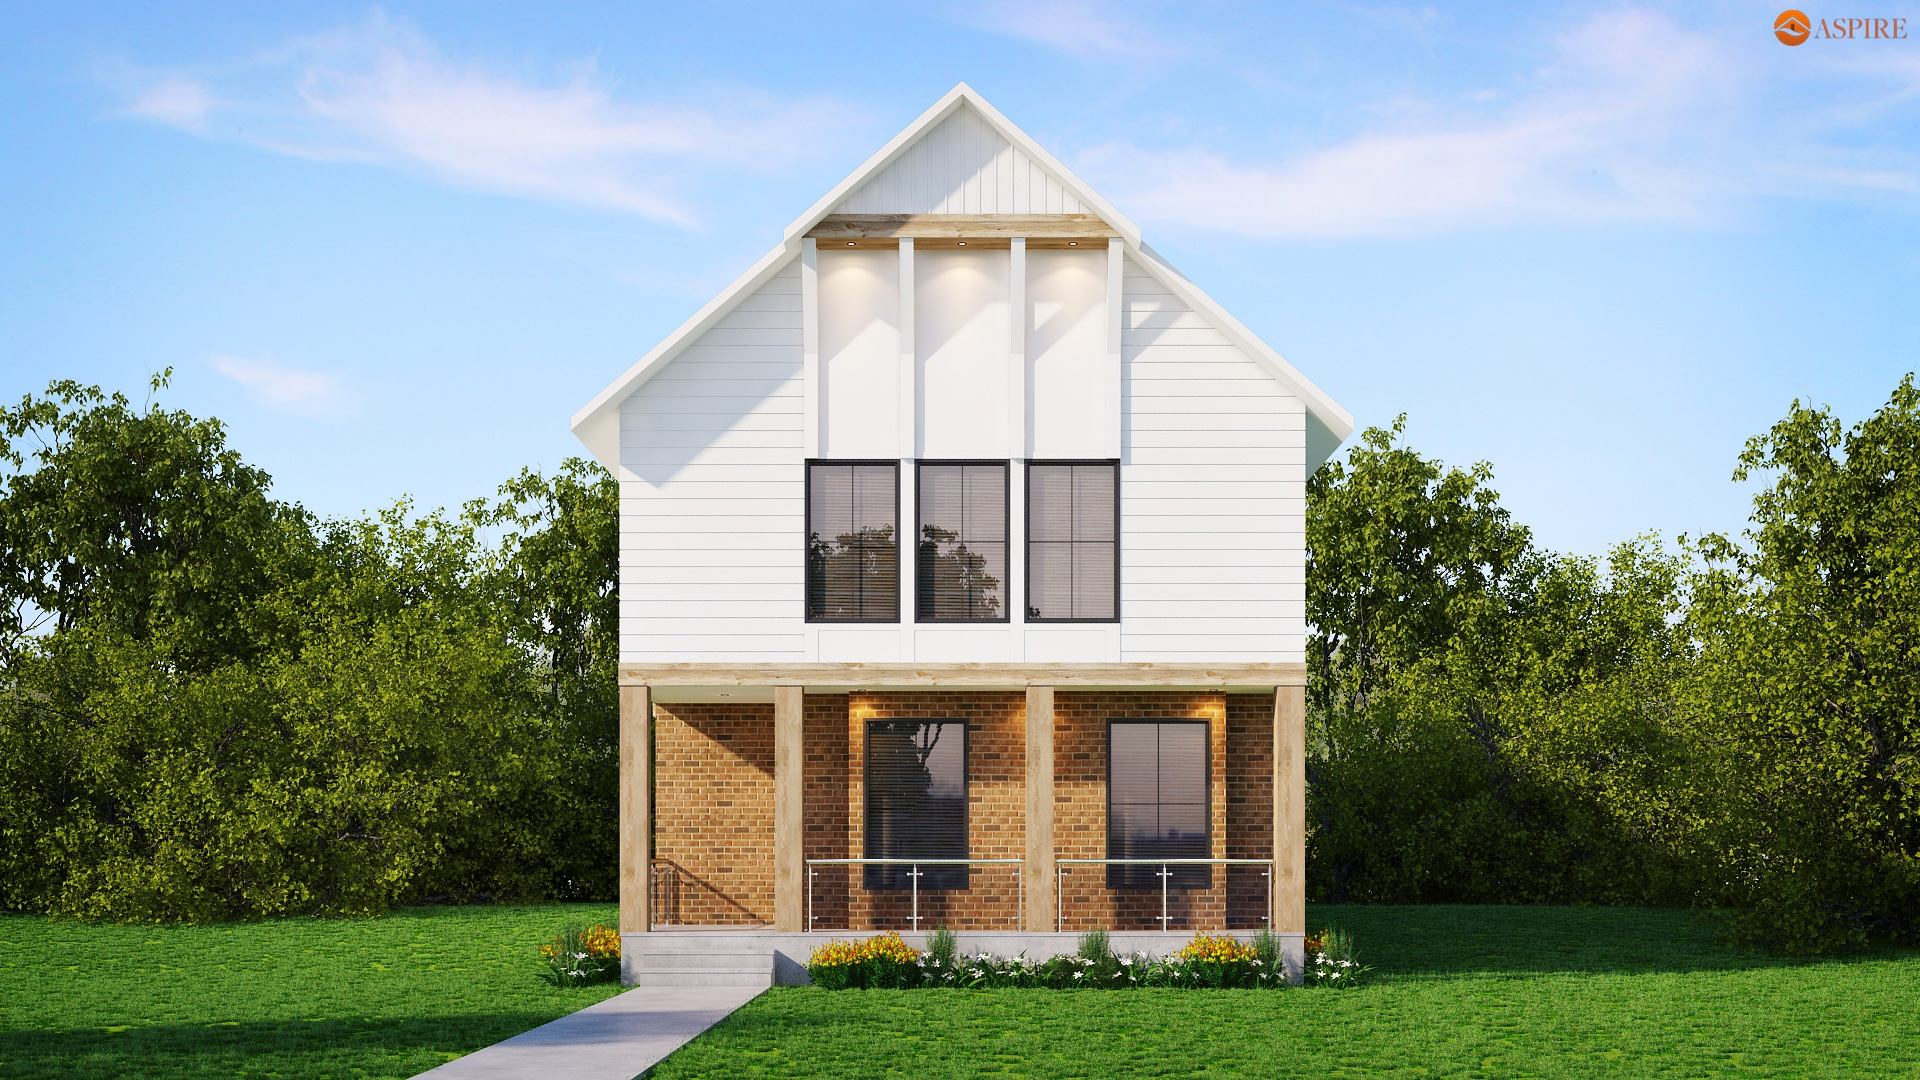 Custom home builder in calgary home renovations by aspire for Exterior home renovations calgary